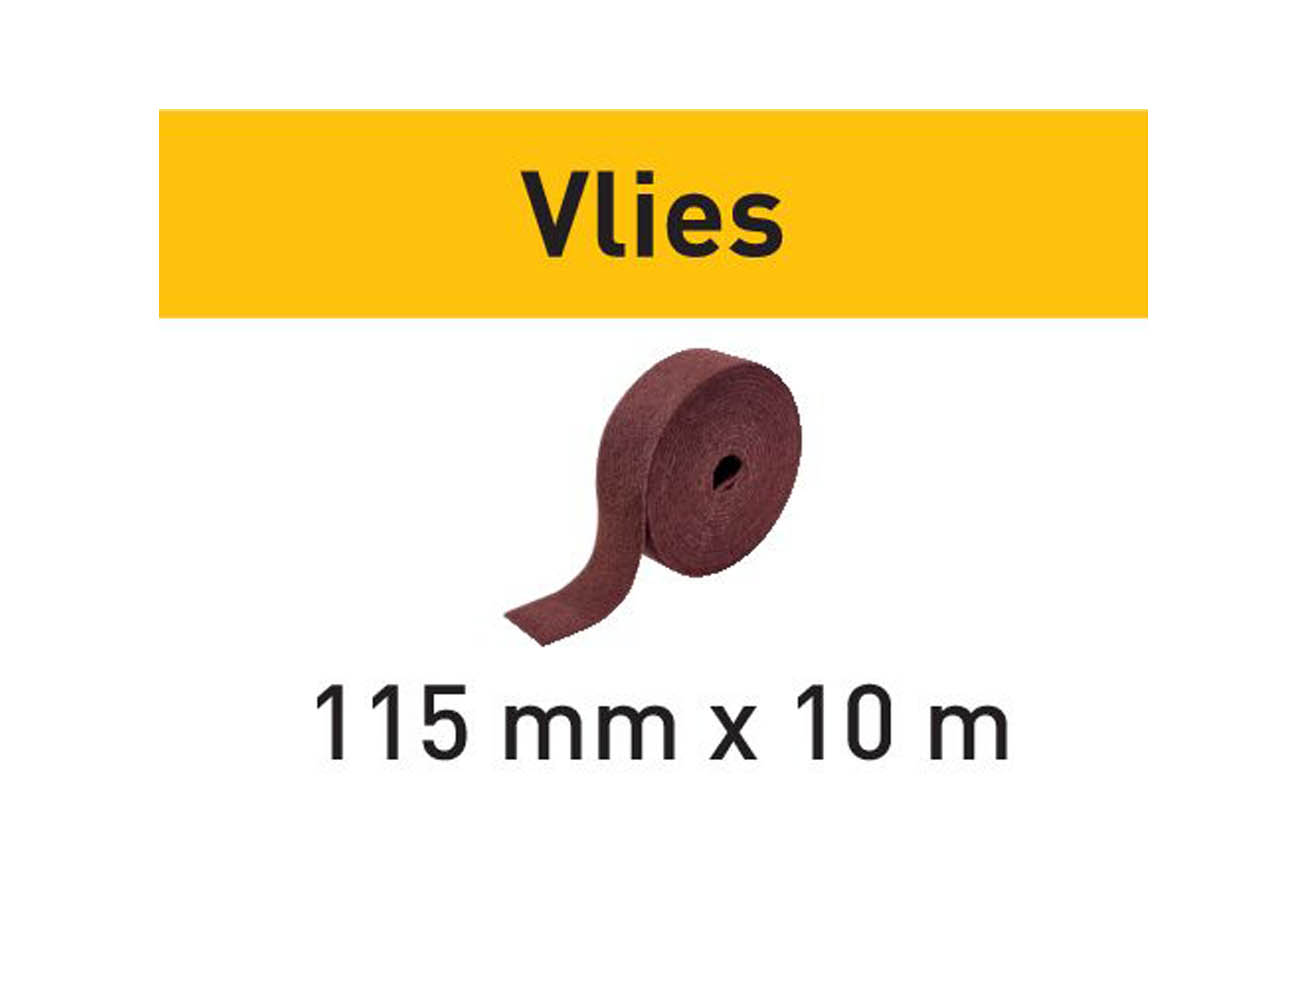 201117 Festool Schleifrolle 115x10m FN 320 VL Vlies